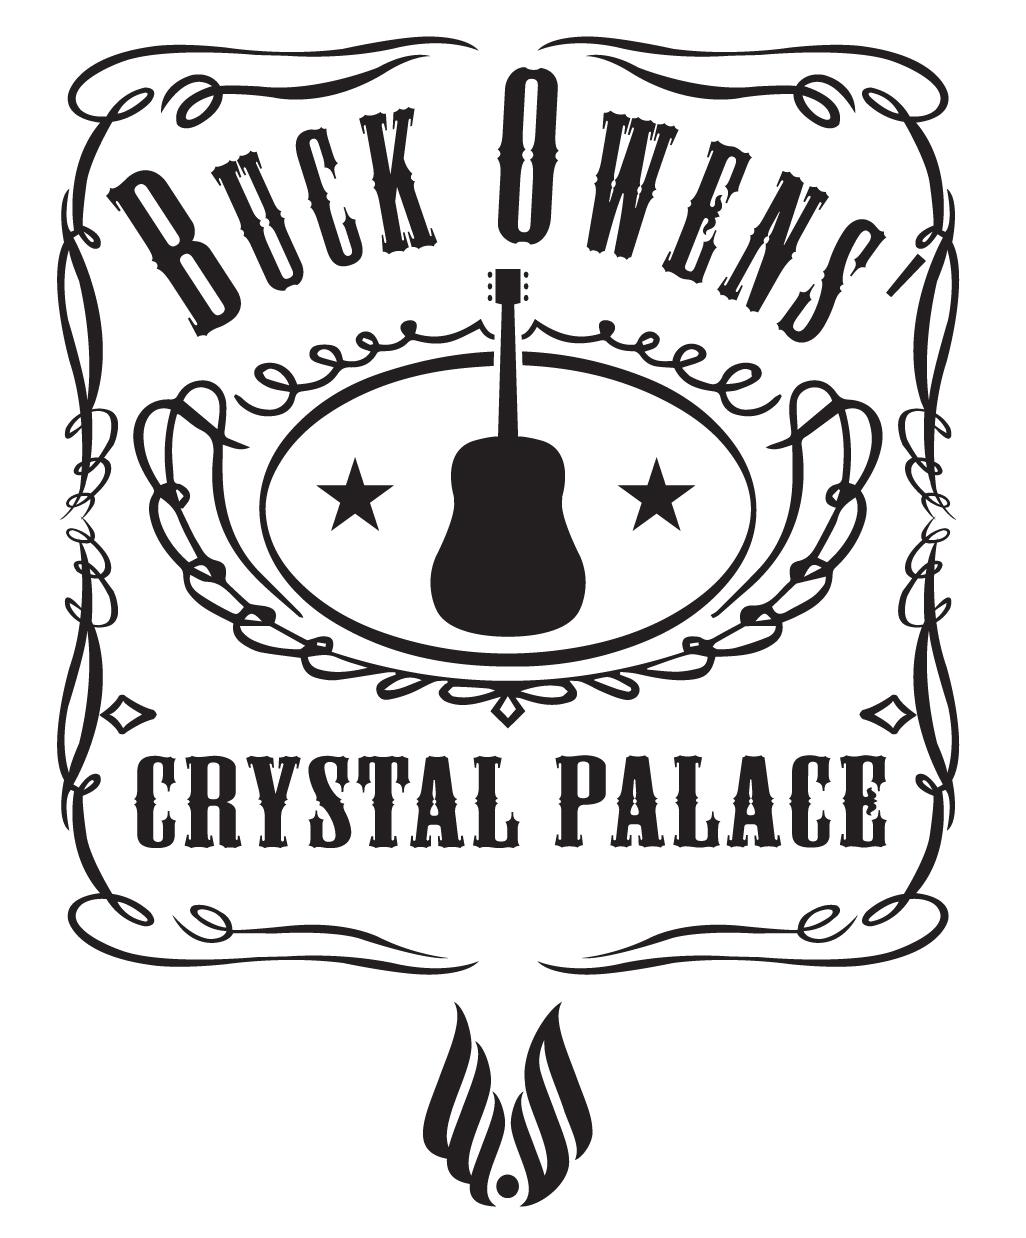 BUCK OWENS' CRYSTAL PALACE